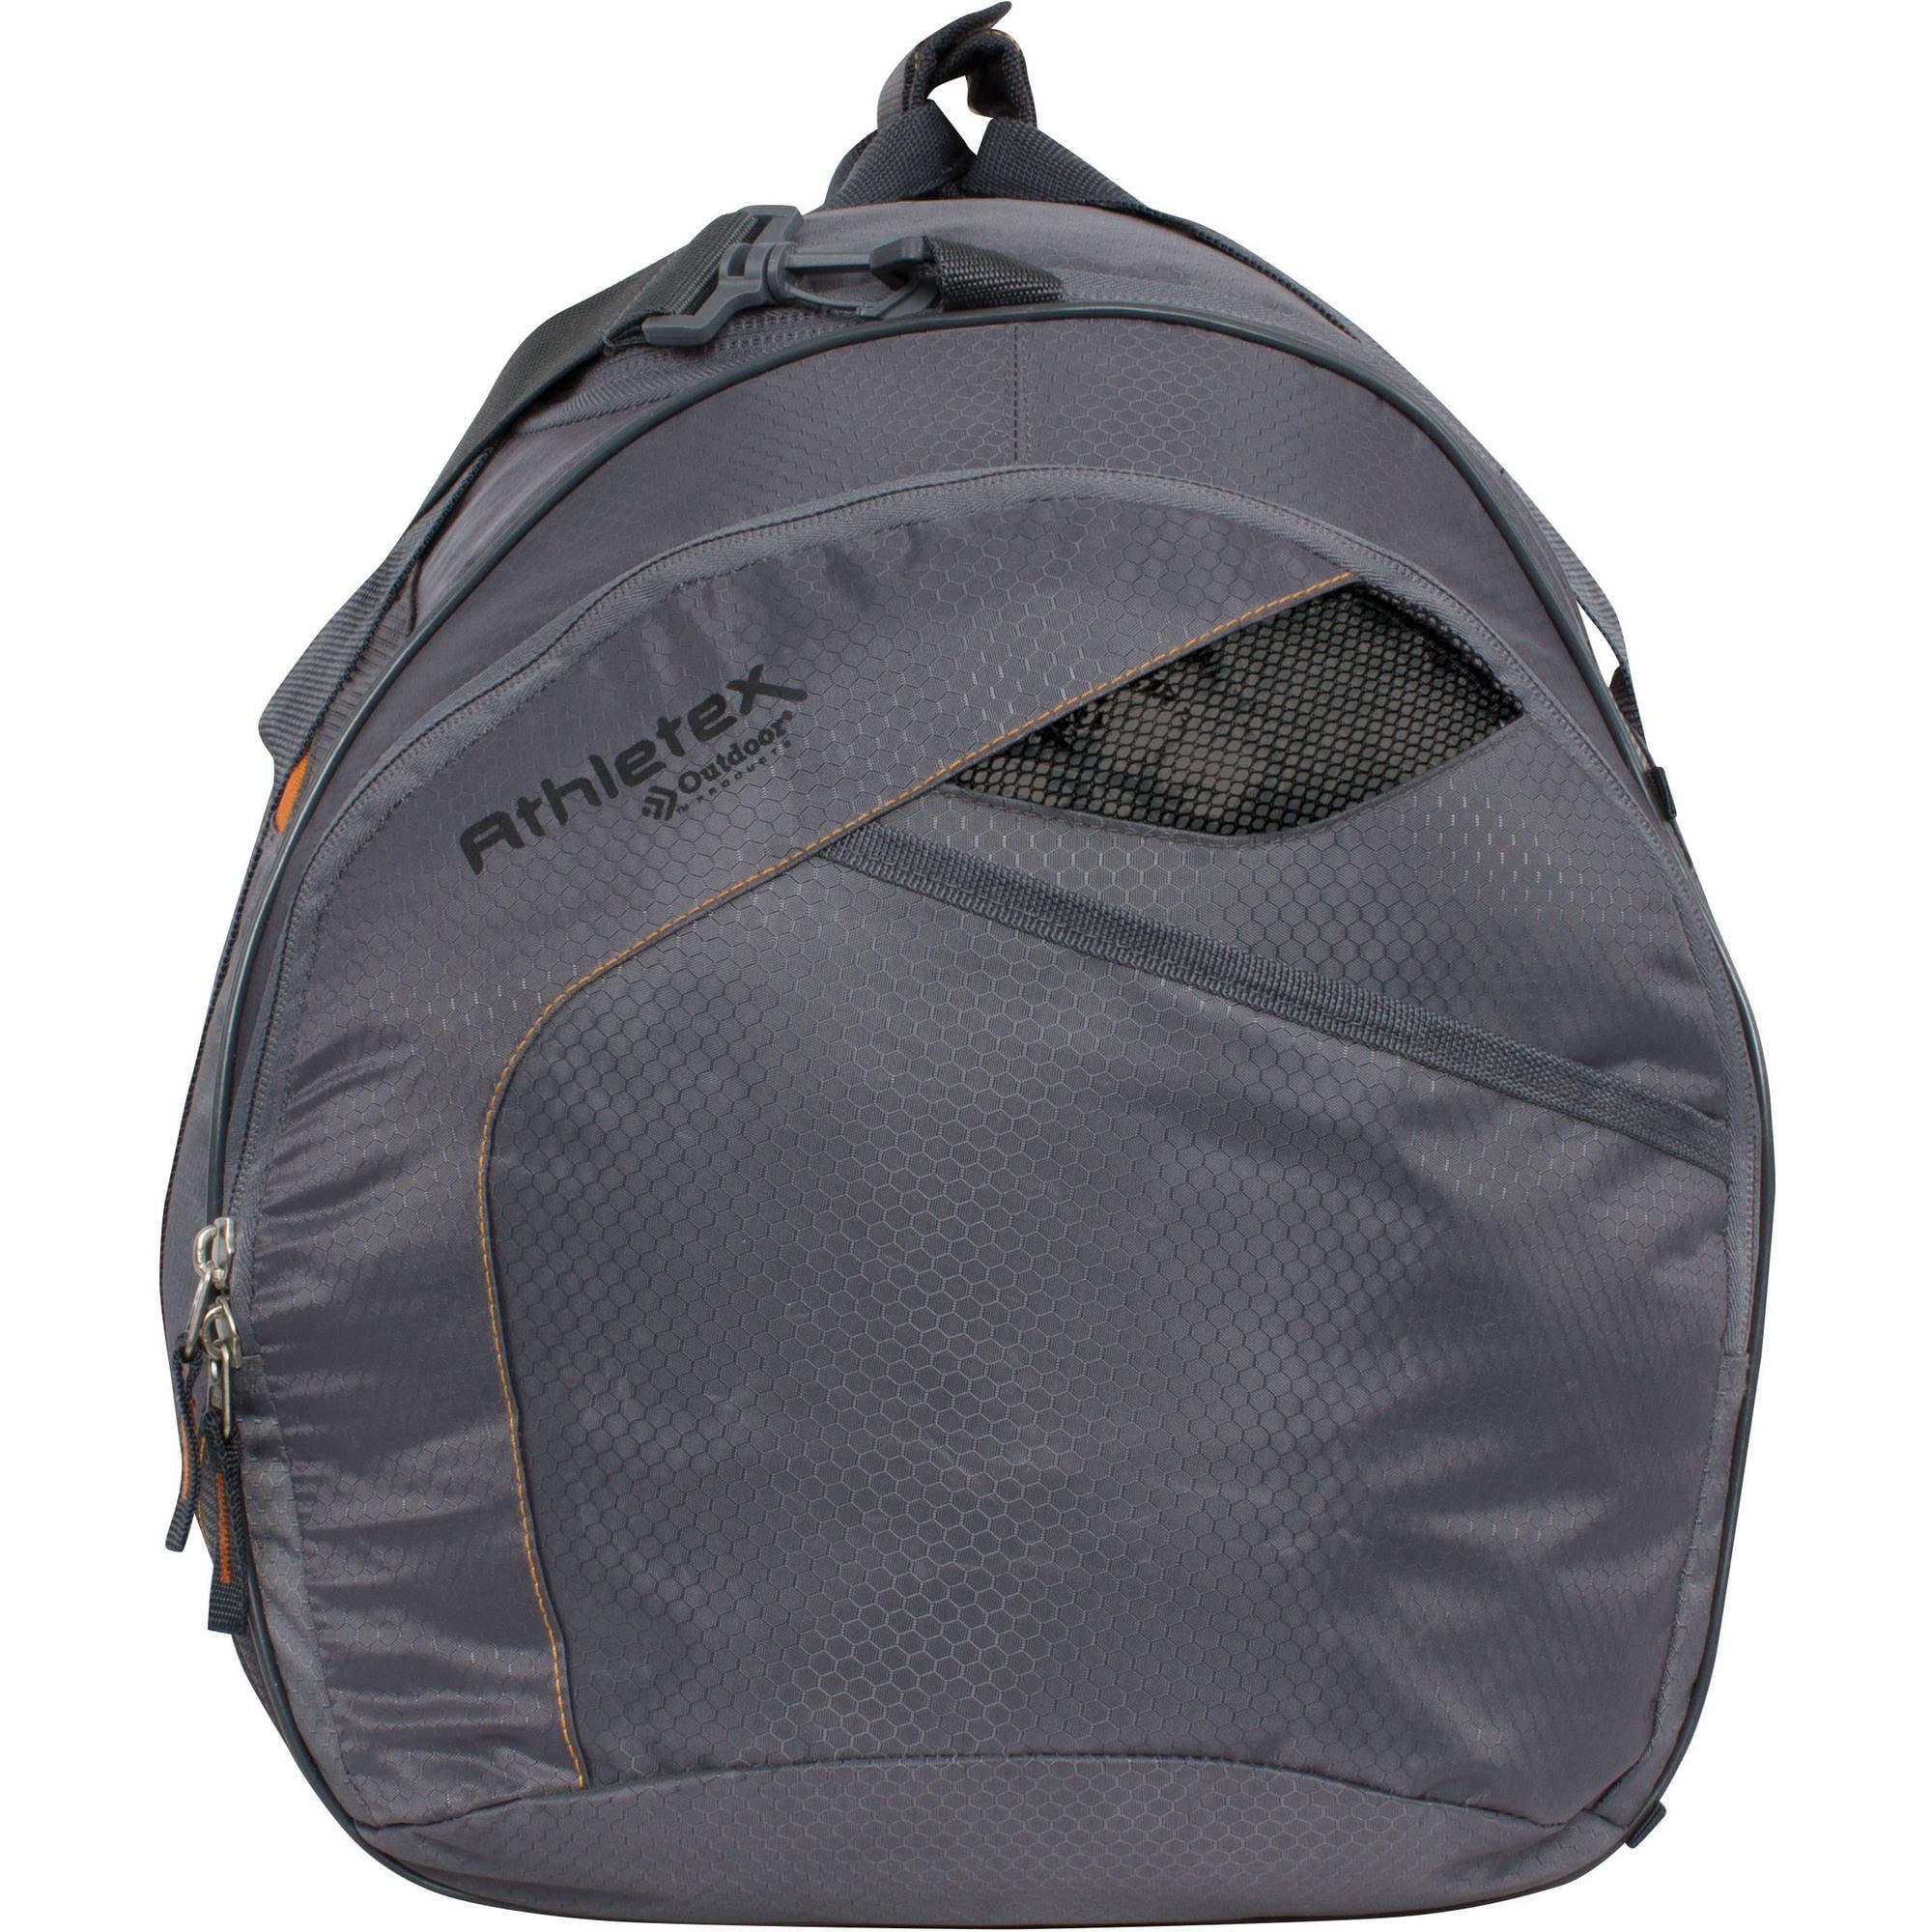 3b6464bbf97d Athletex Ballistic Duffle Bag